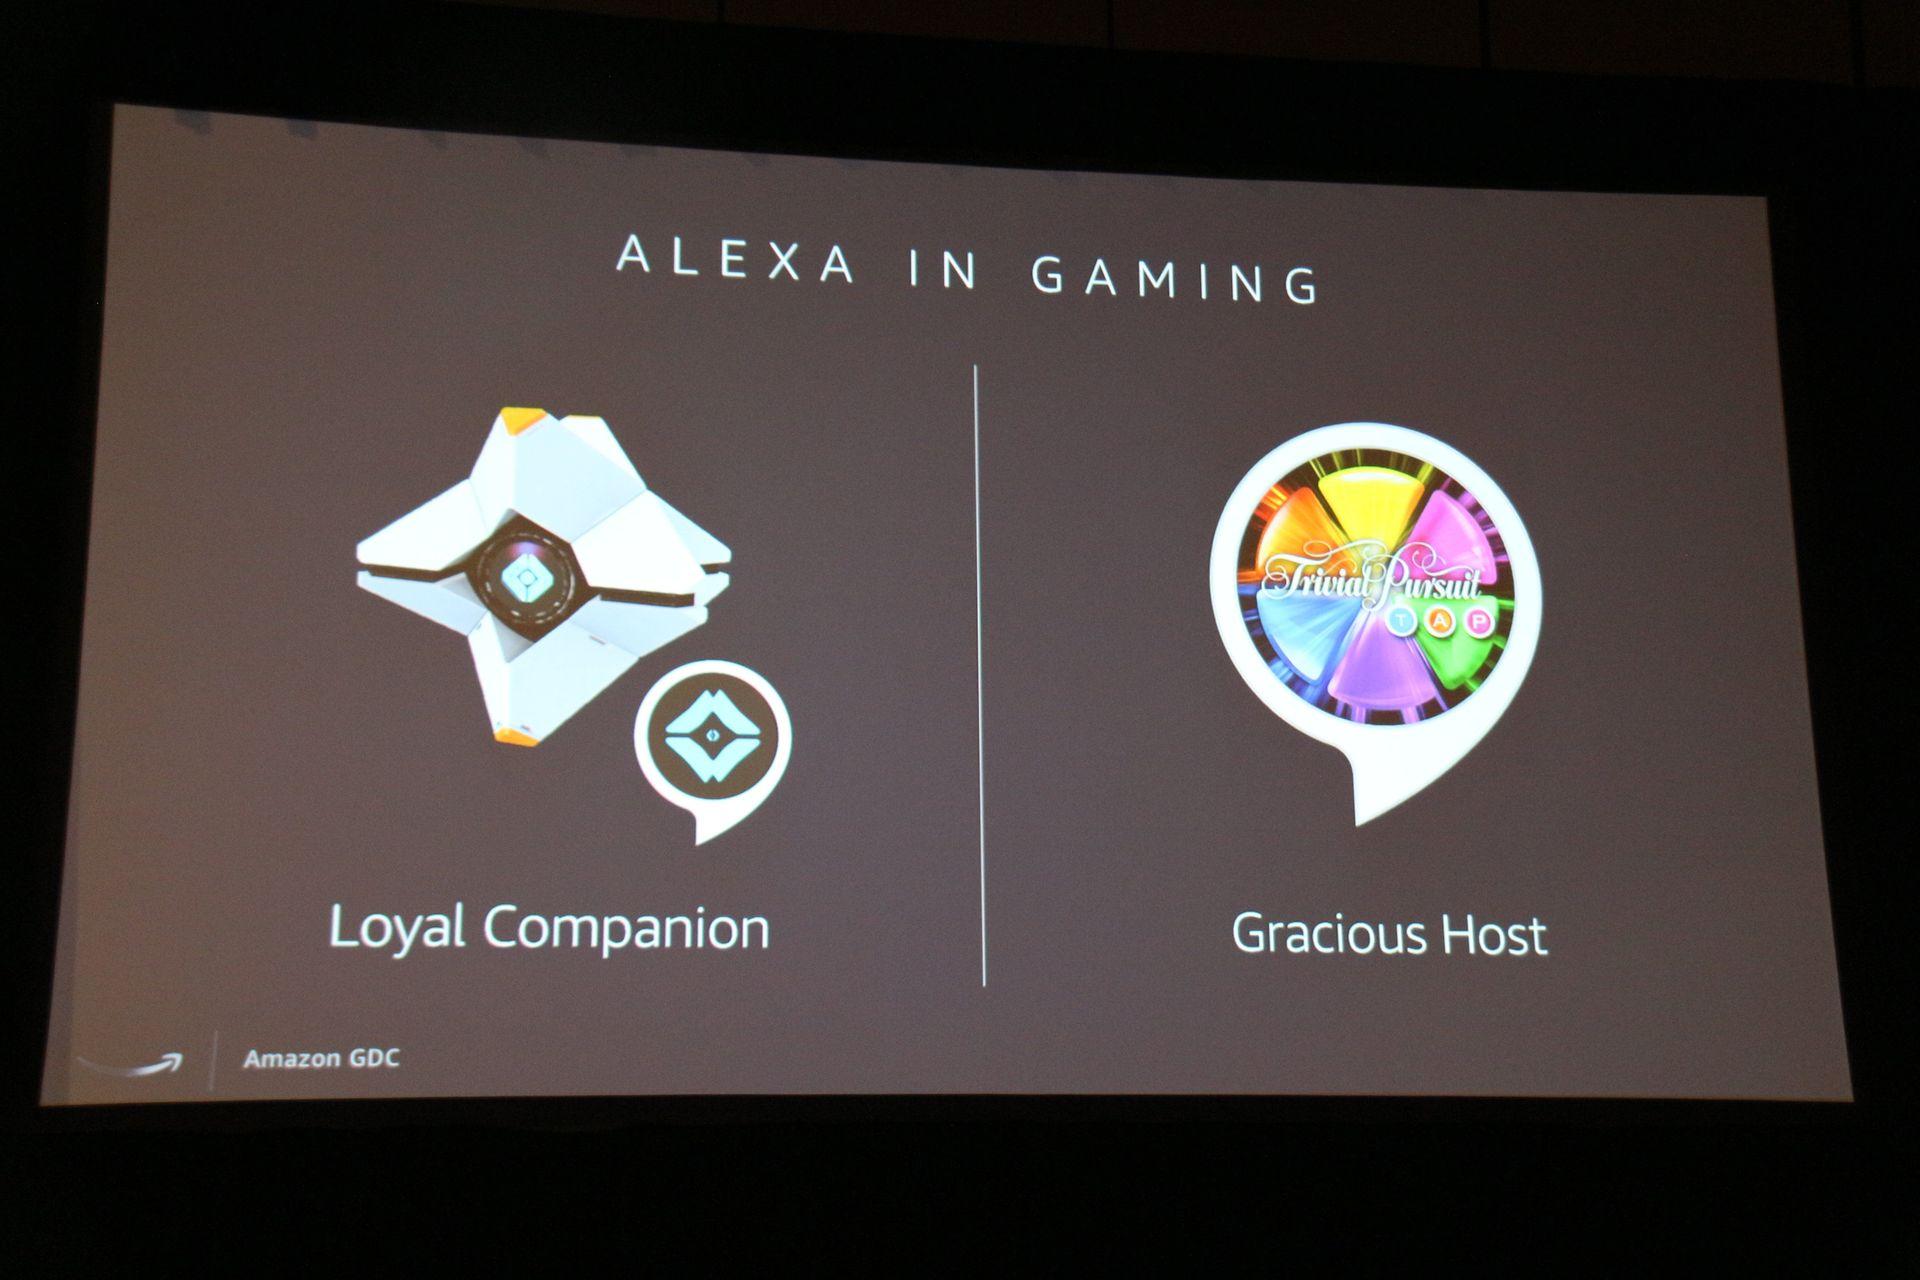 Alexaゲームは、コンパニオンタイプとホストタイプにわかれる